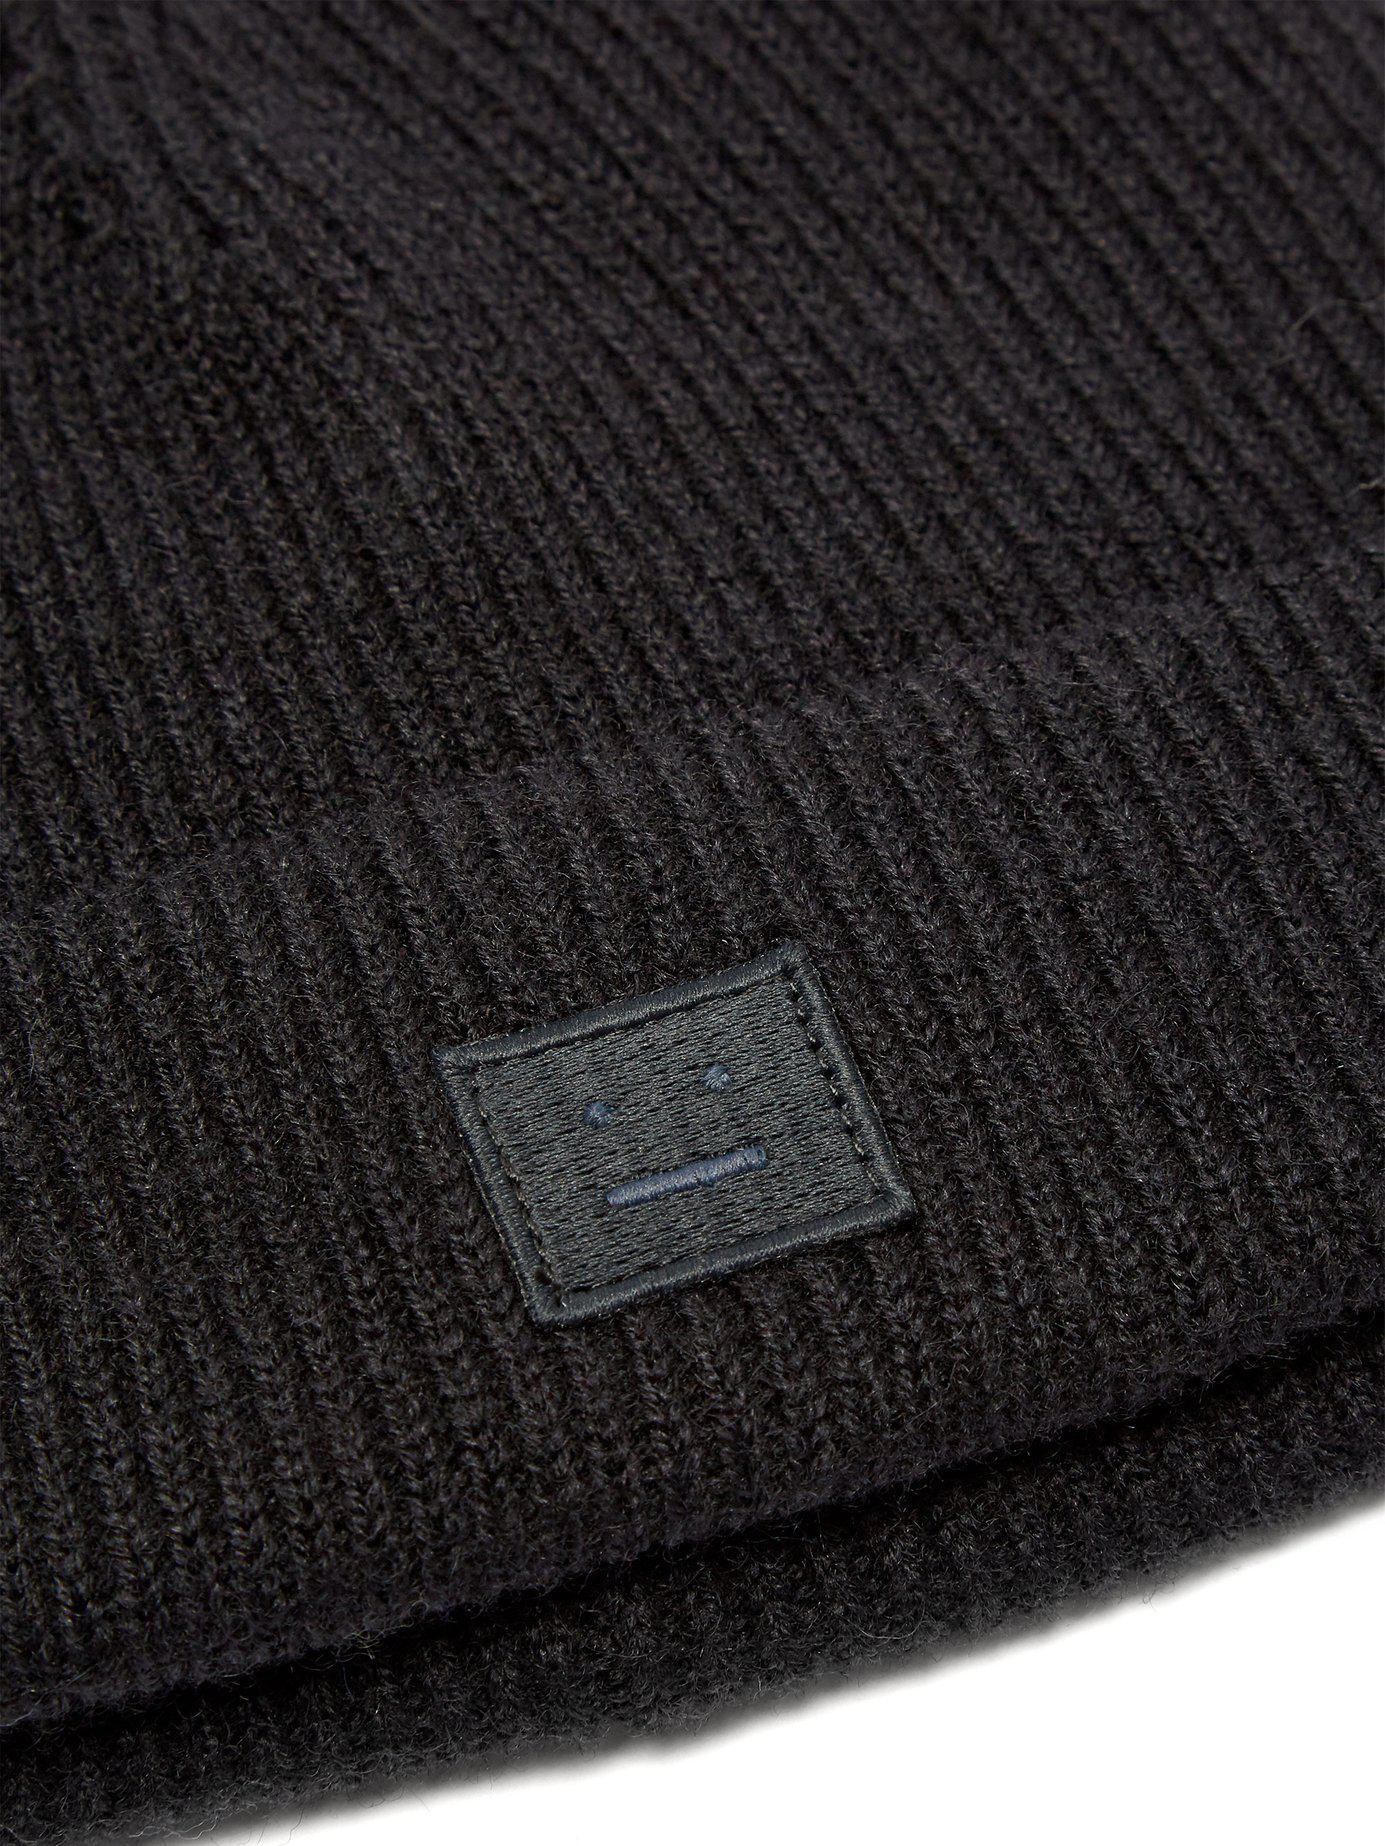 9e31a1e5c2e Acne - Black Kansy Face Wool Blend Beanie Hat for Men - Lyst. View  fullscreen